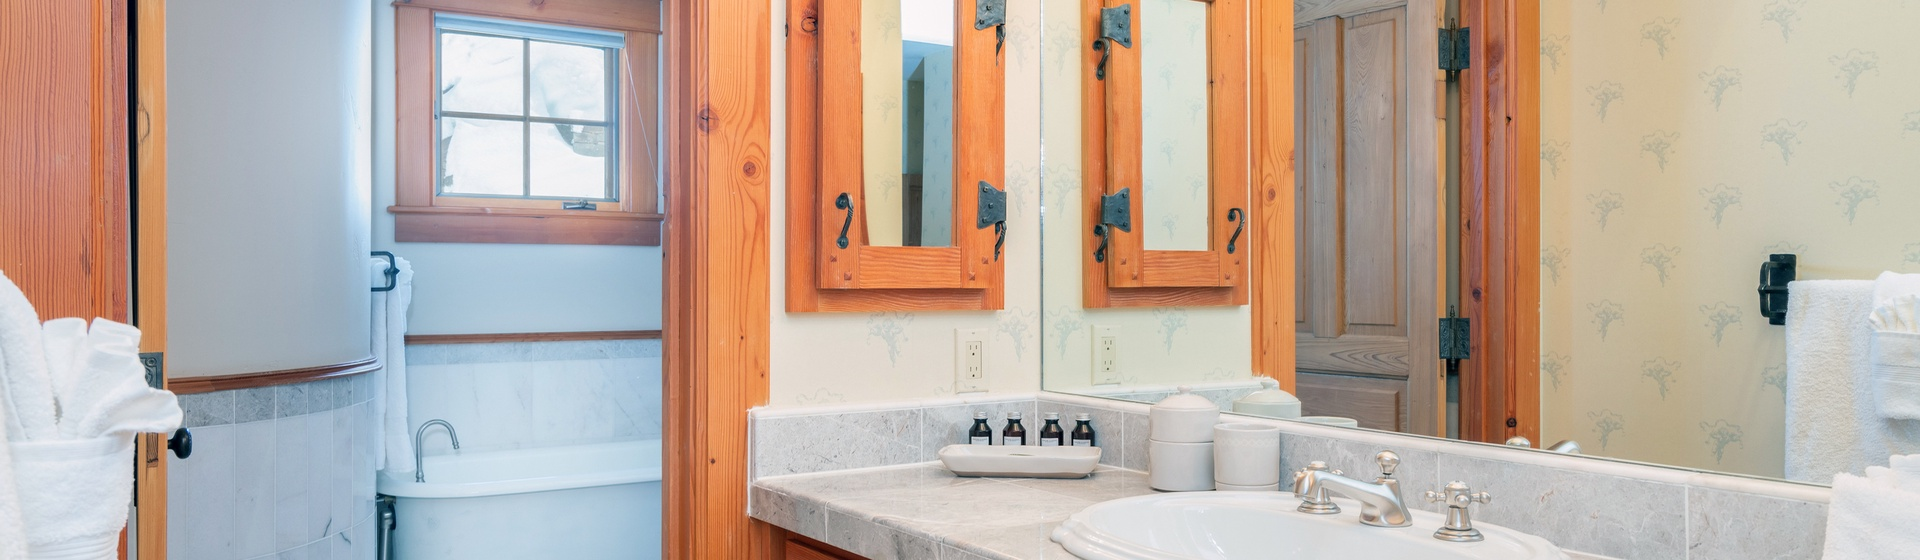 34-MountainVillage-Positive-Outlook-Queen-Guest-Bathroom-Vanity-Web.jpg